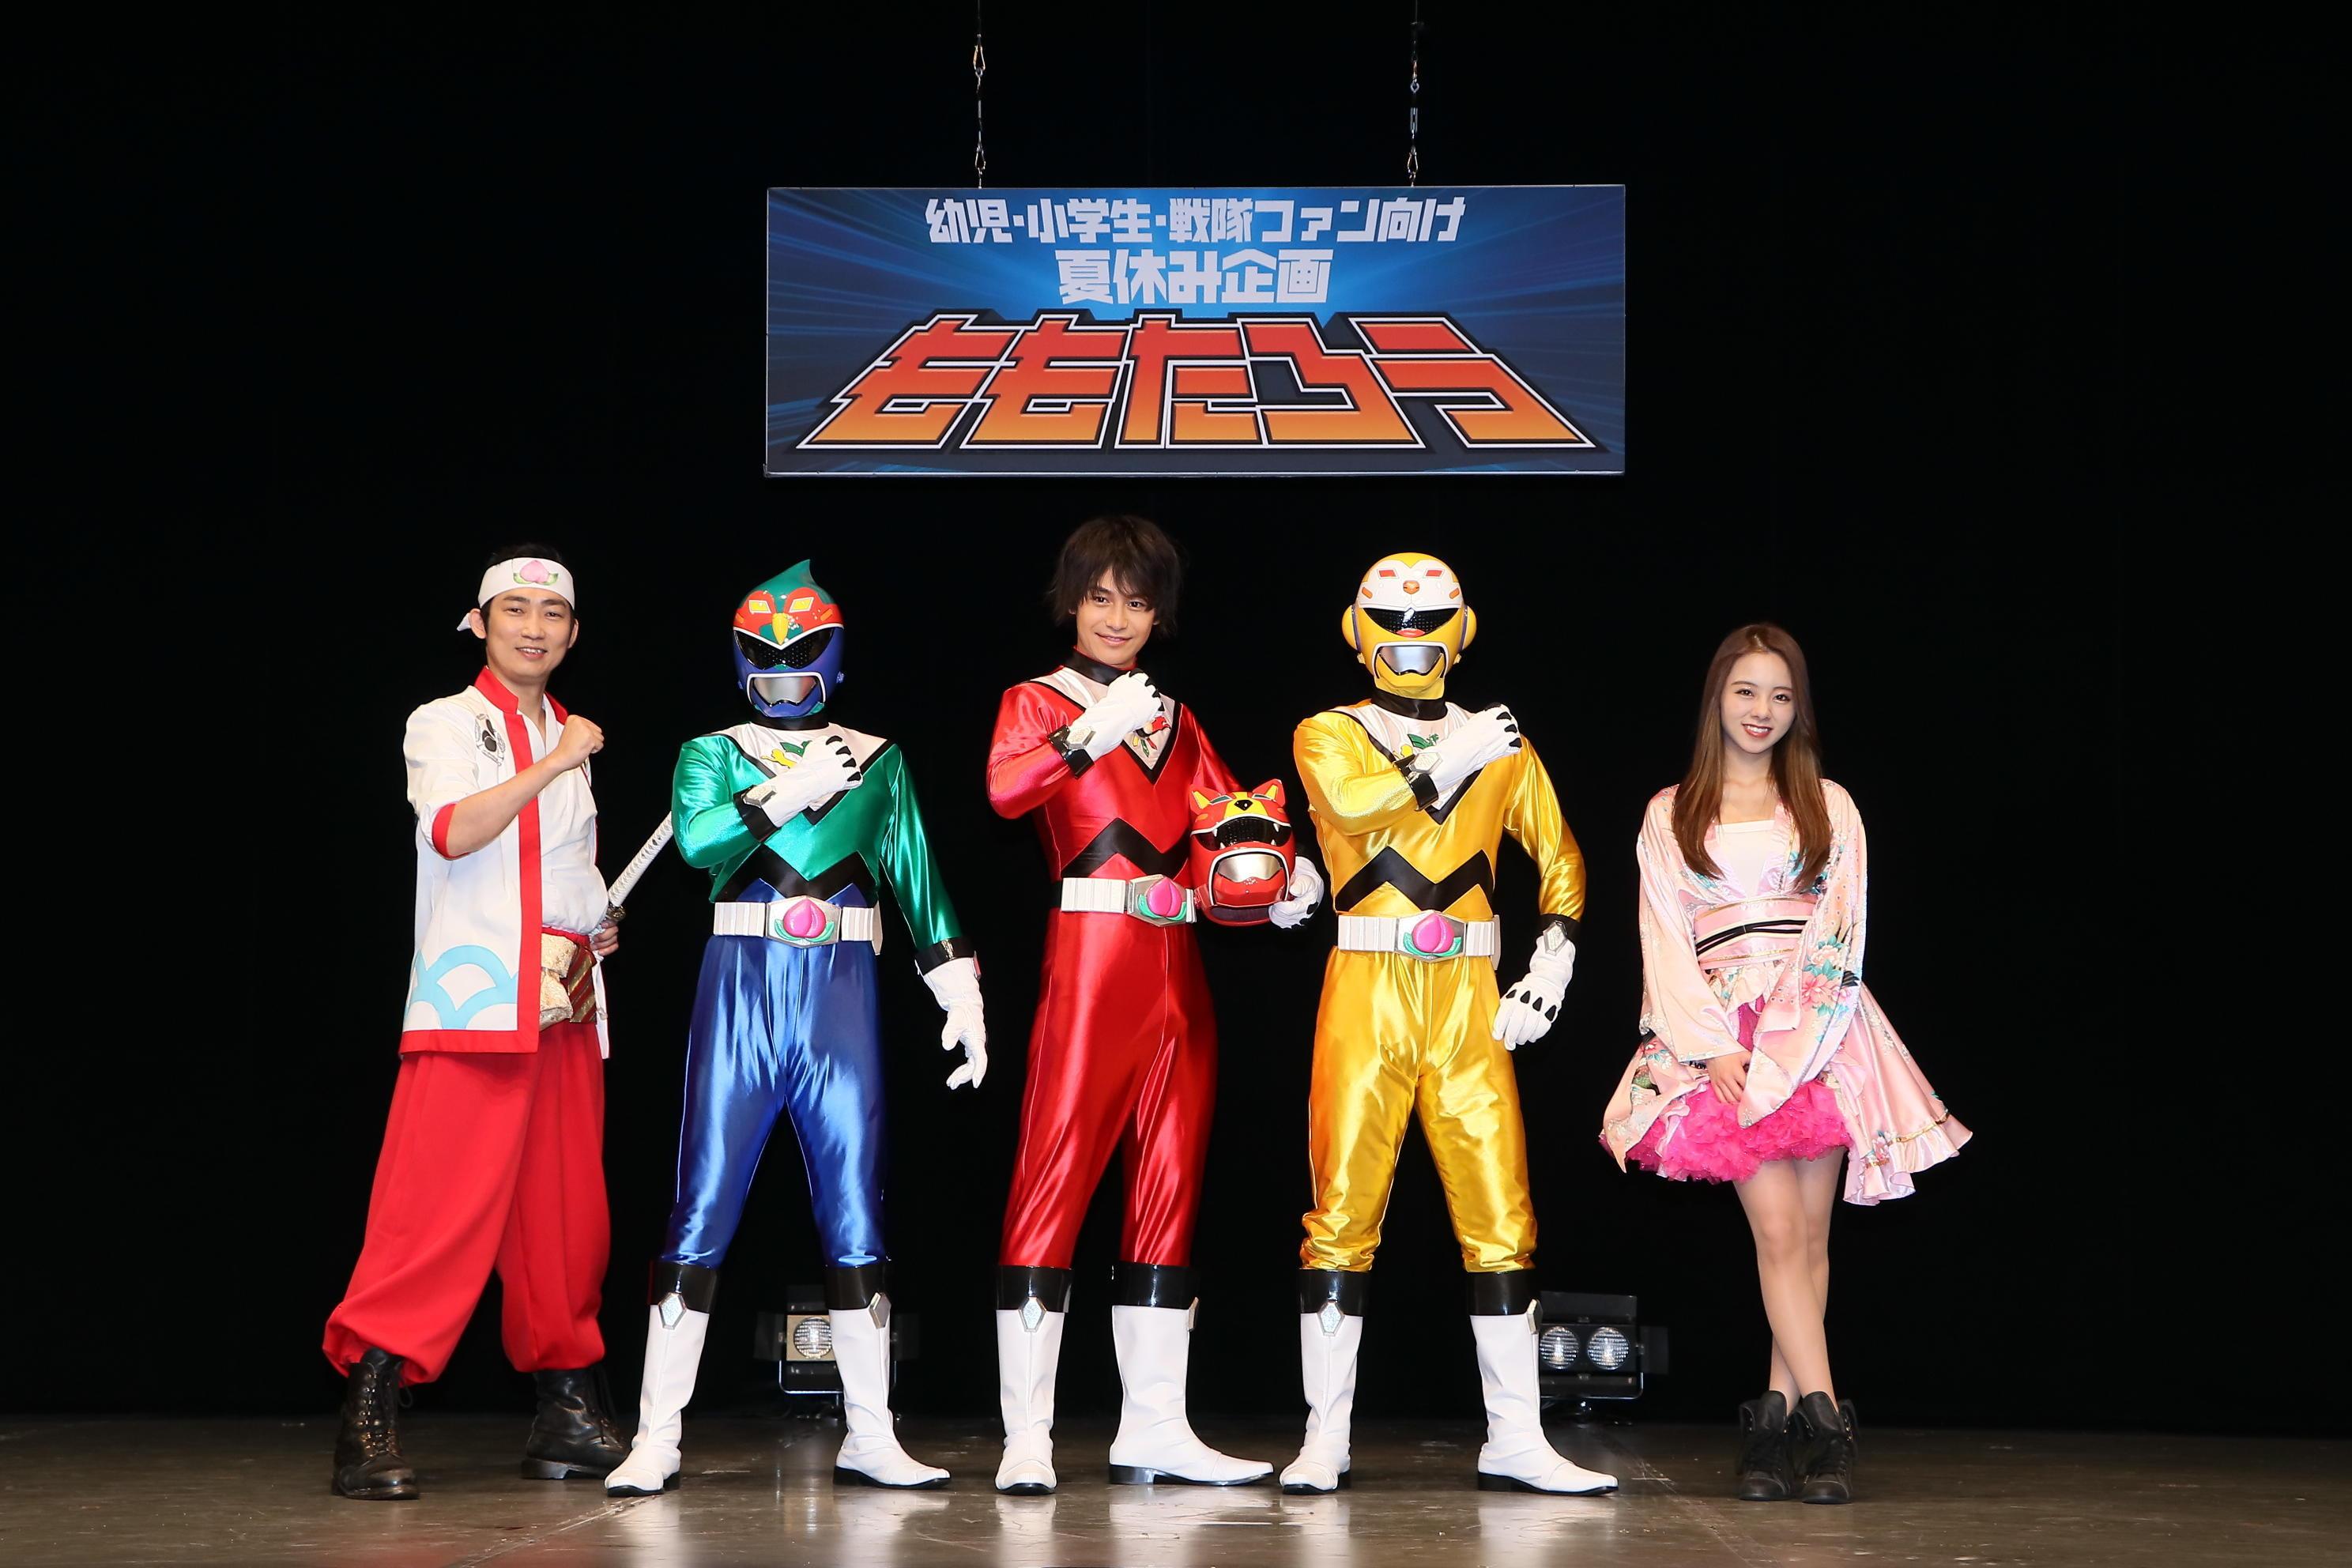 http://news.yoshimoto.co.jp/20180531200007-690f659438426906544072e0fe9d48c95e4b7cbe.jpg